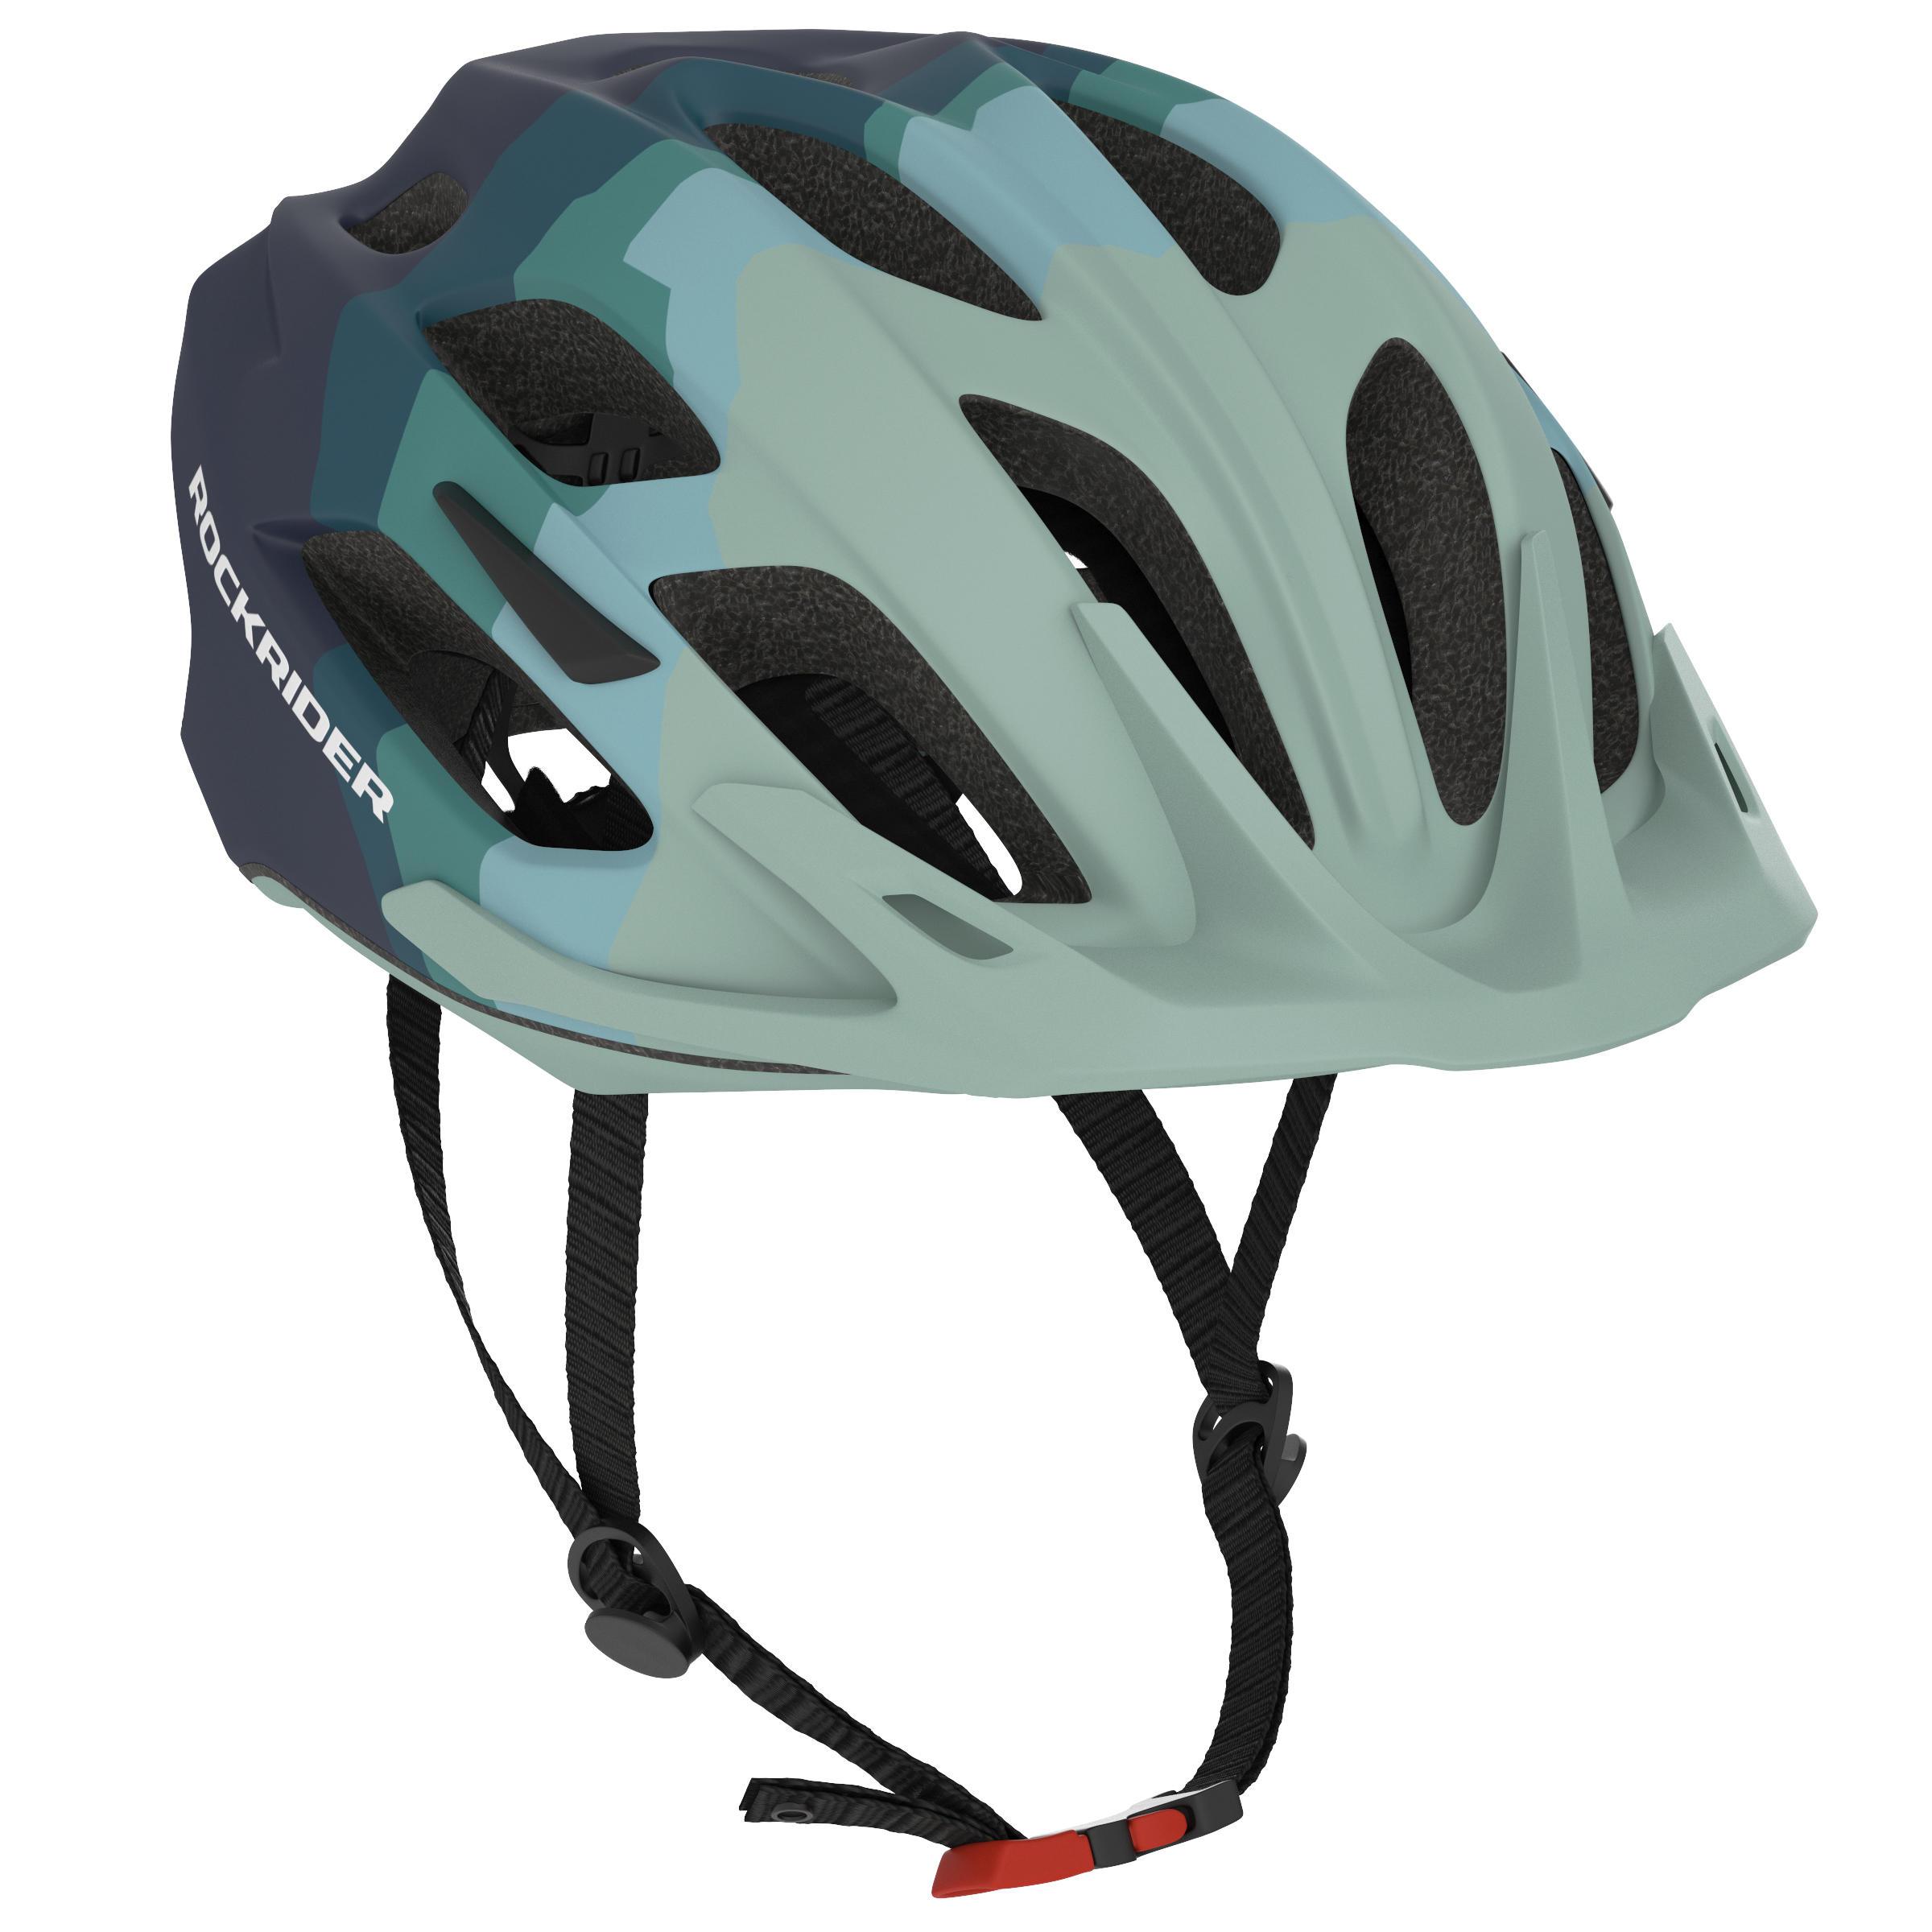 Damen Rockrider Fahrradhelm MTB ST 500 Damen blau/grün | 03608409856180